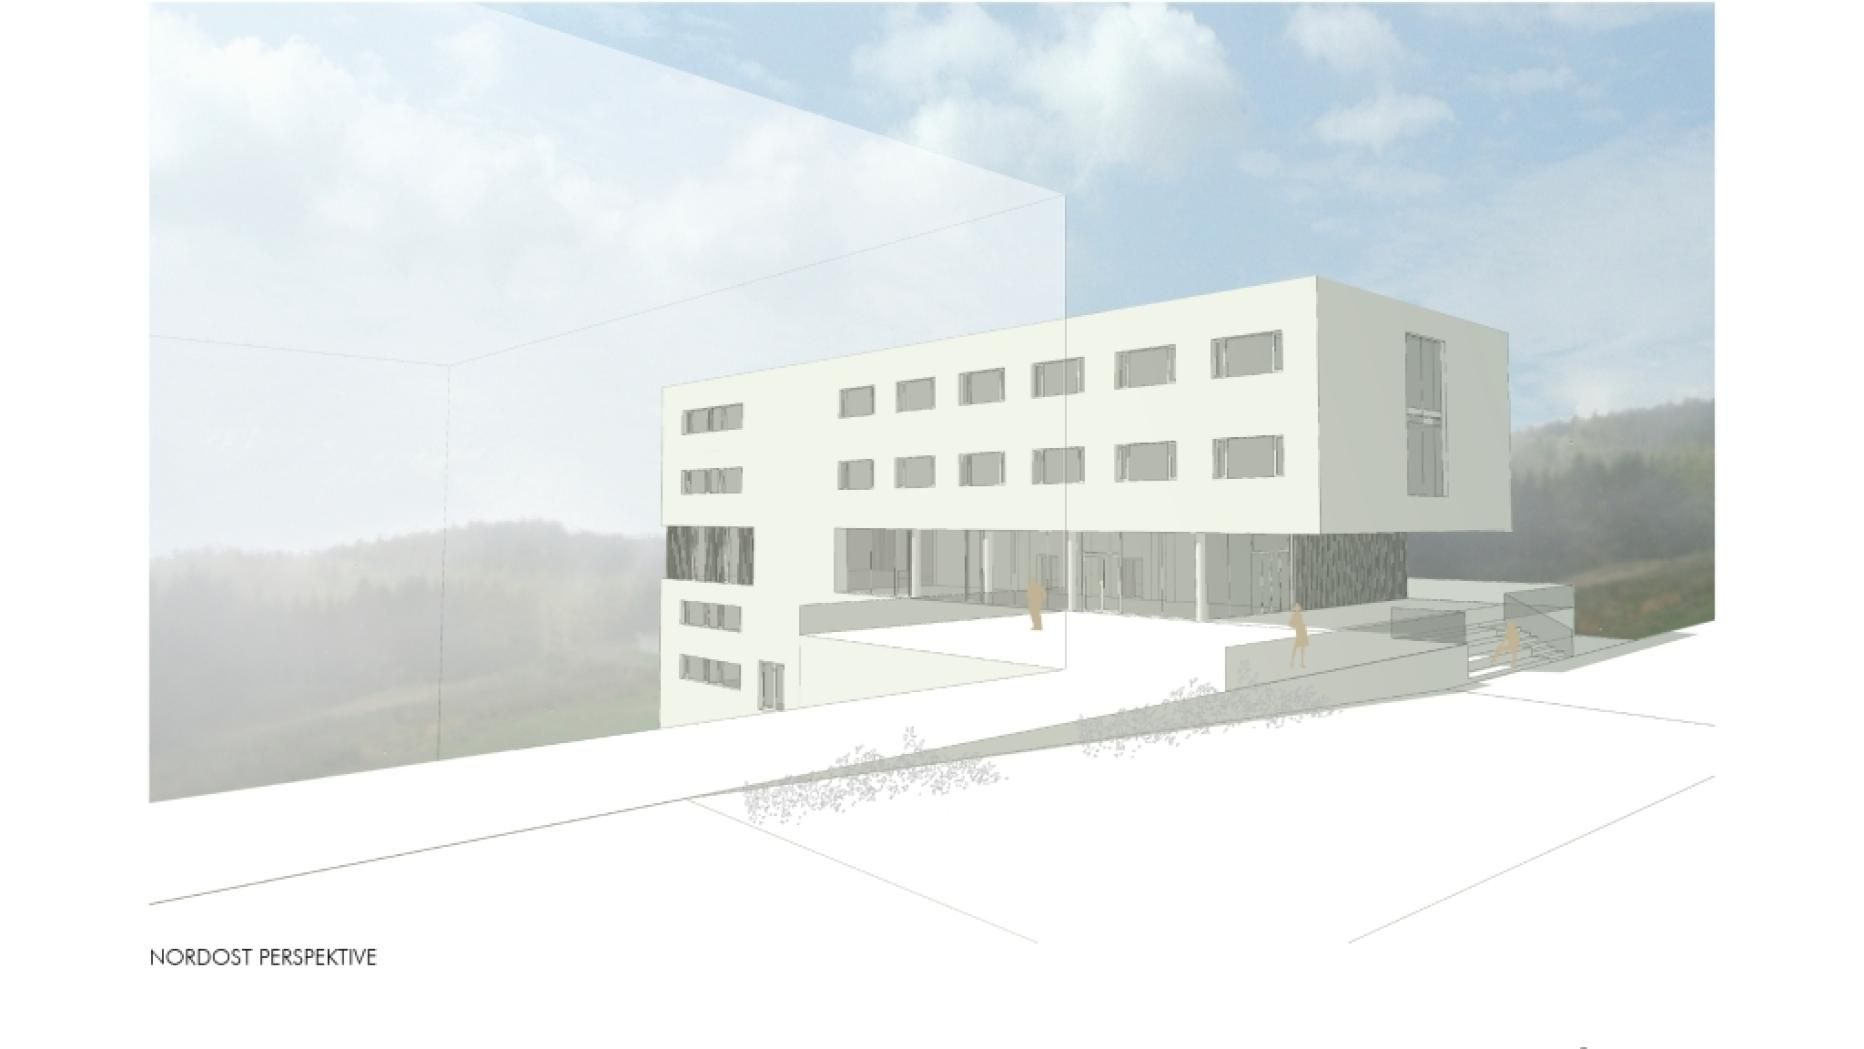 FH Hagenberg: Neues Studiengebäude eröffnet | futurezone at